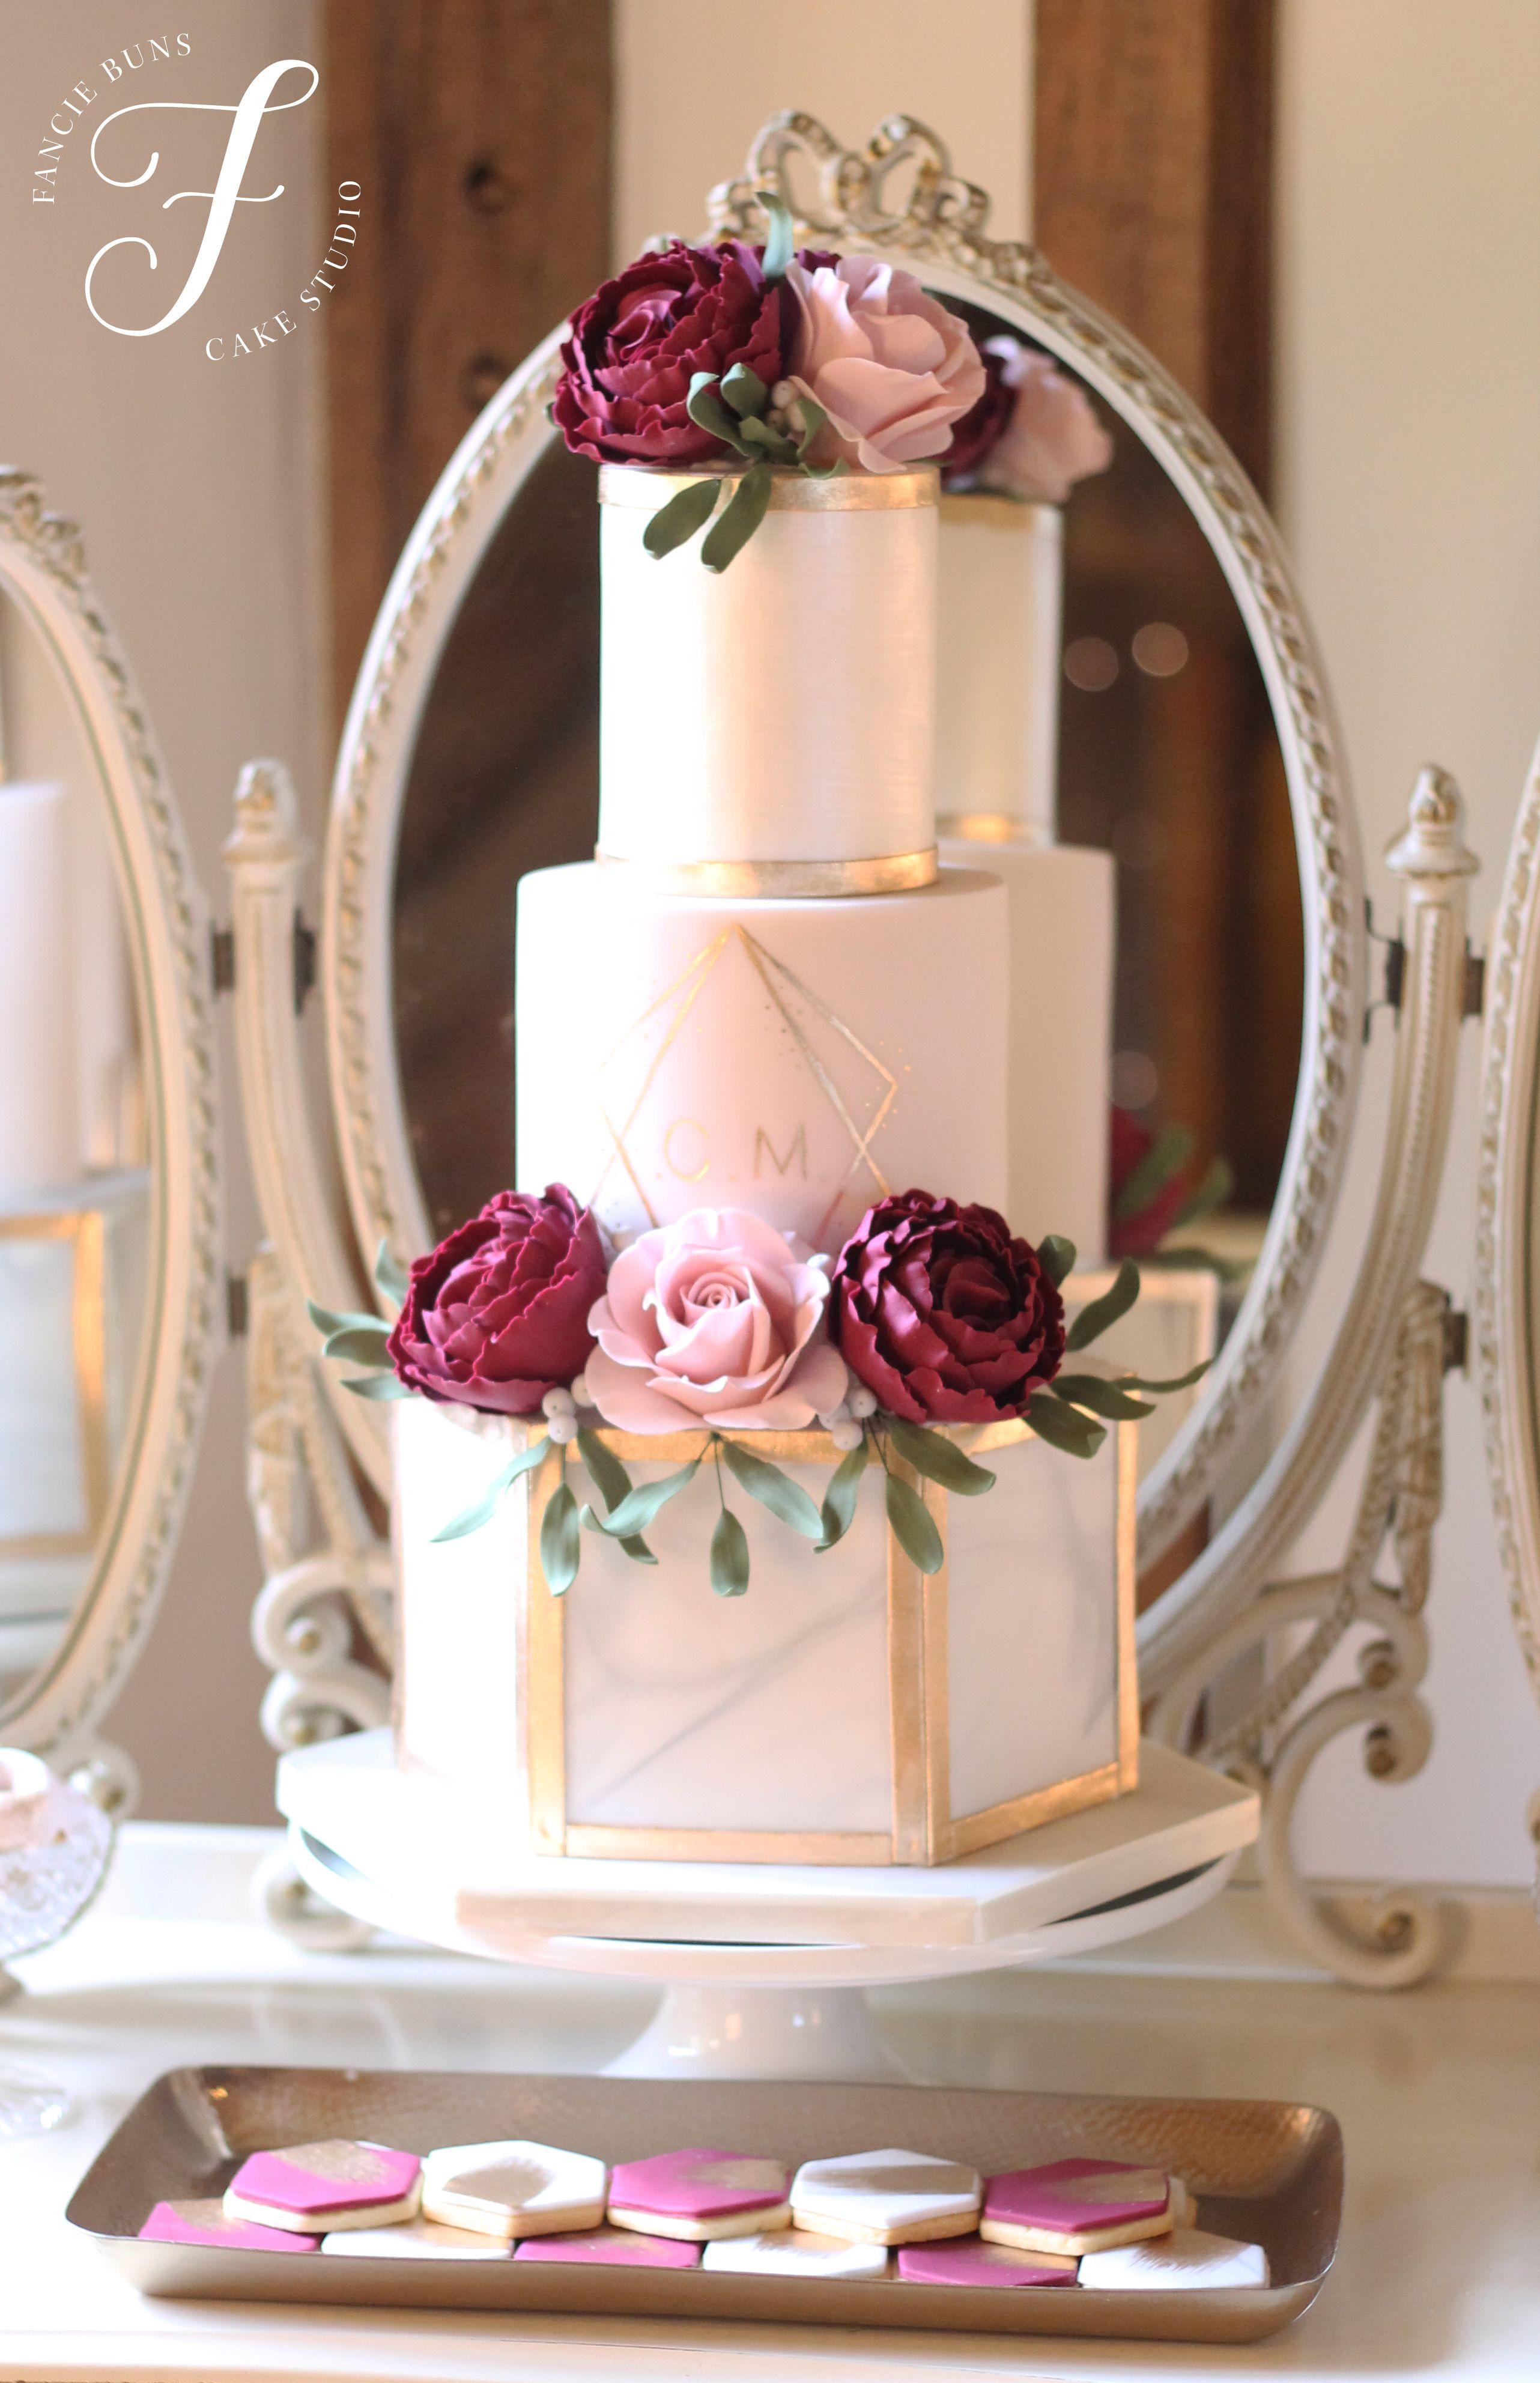 Blush, Burgundy & gold styled cake table, main cake